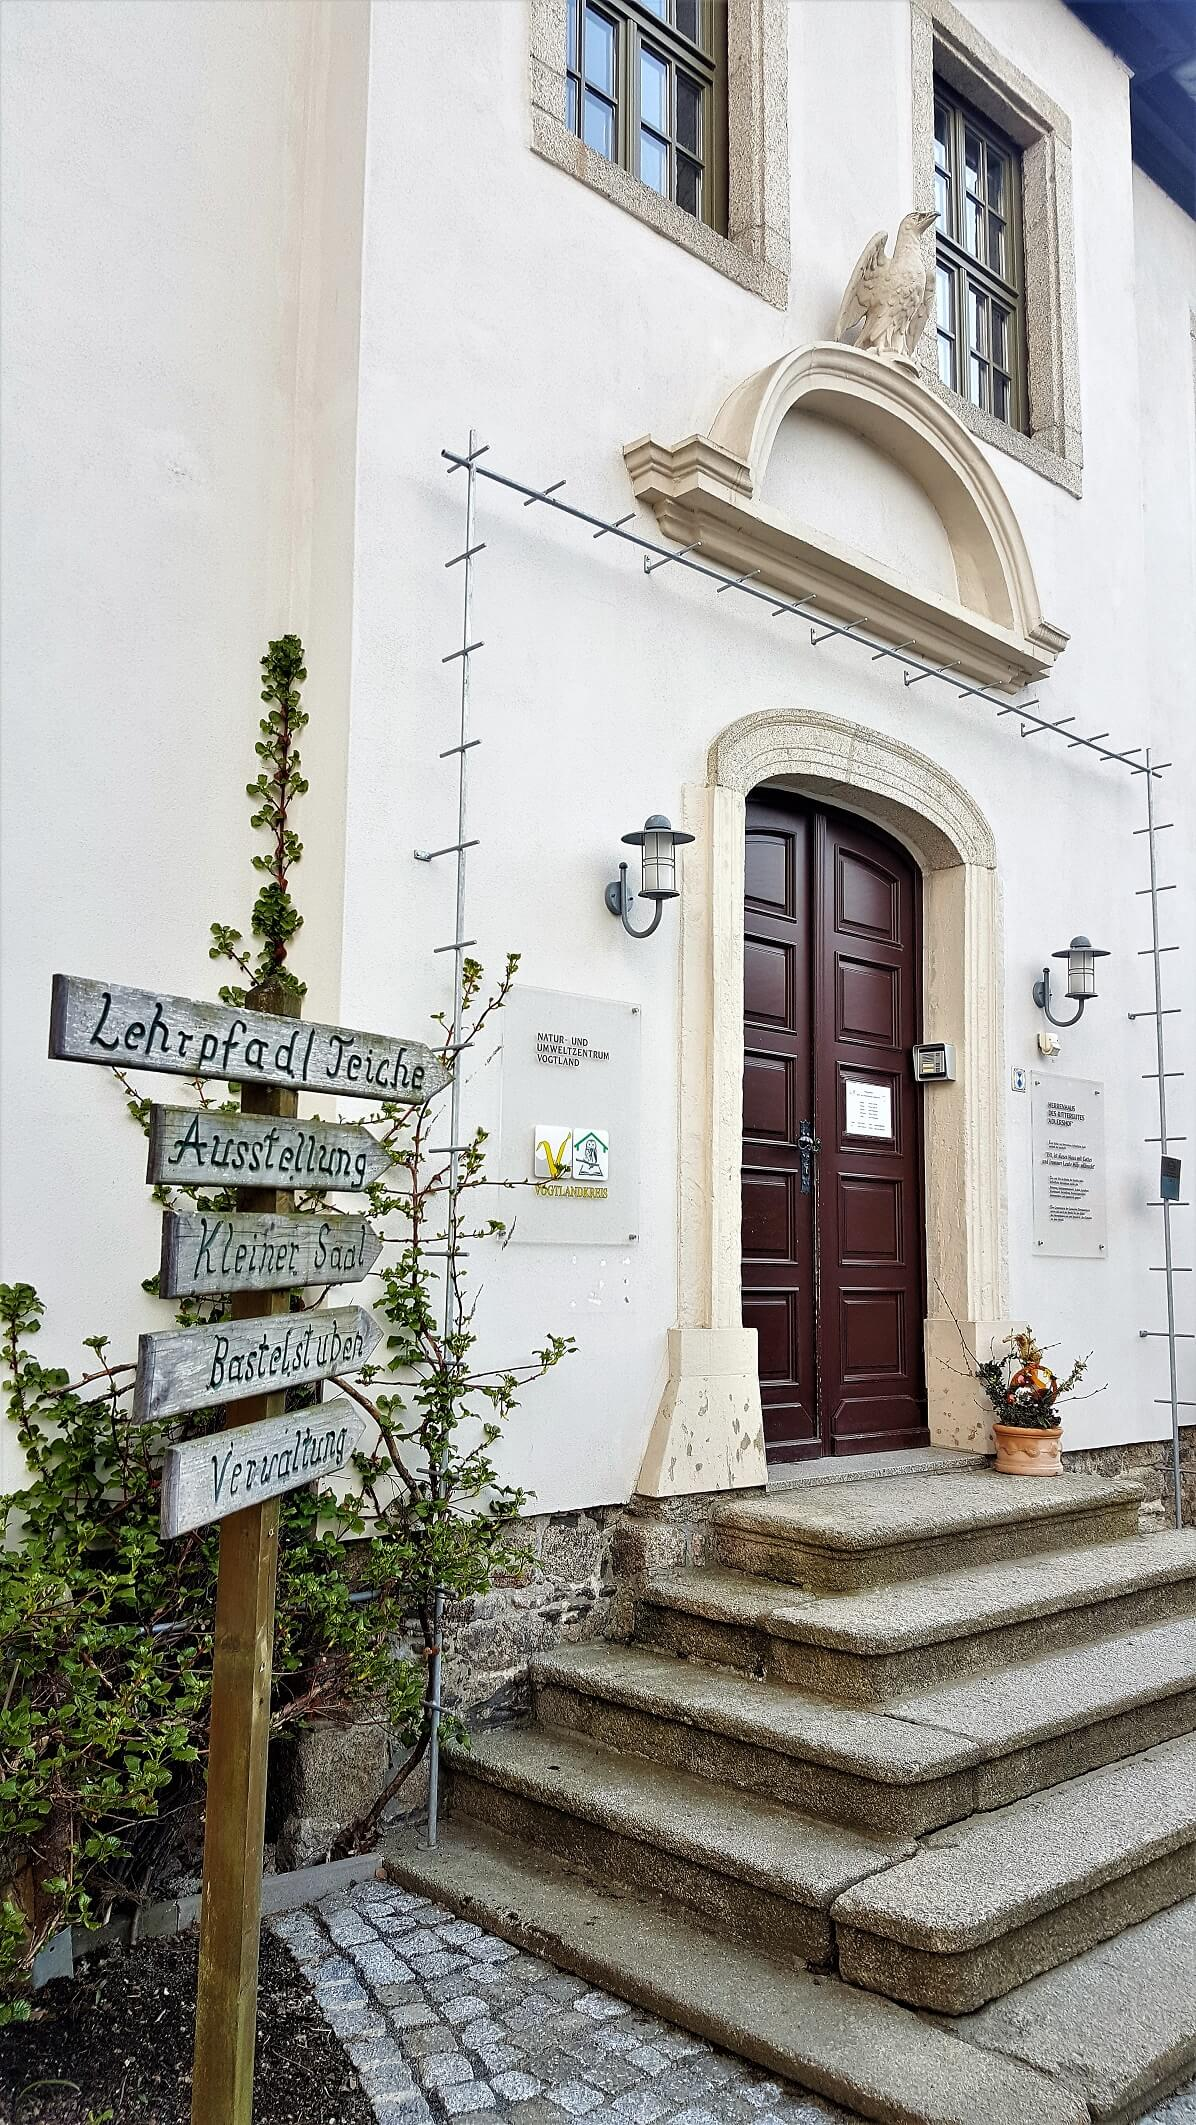 Rittergut Adlershof zu Oberlauterbach - Wegweiser Herrenhaus © Jens Reiher